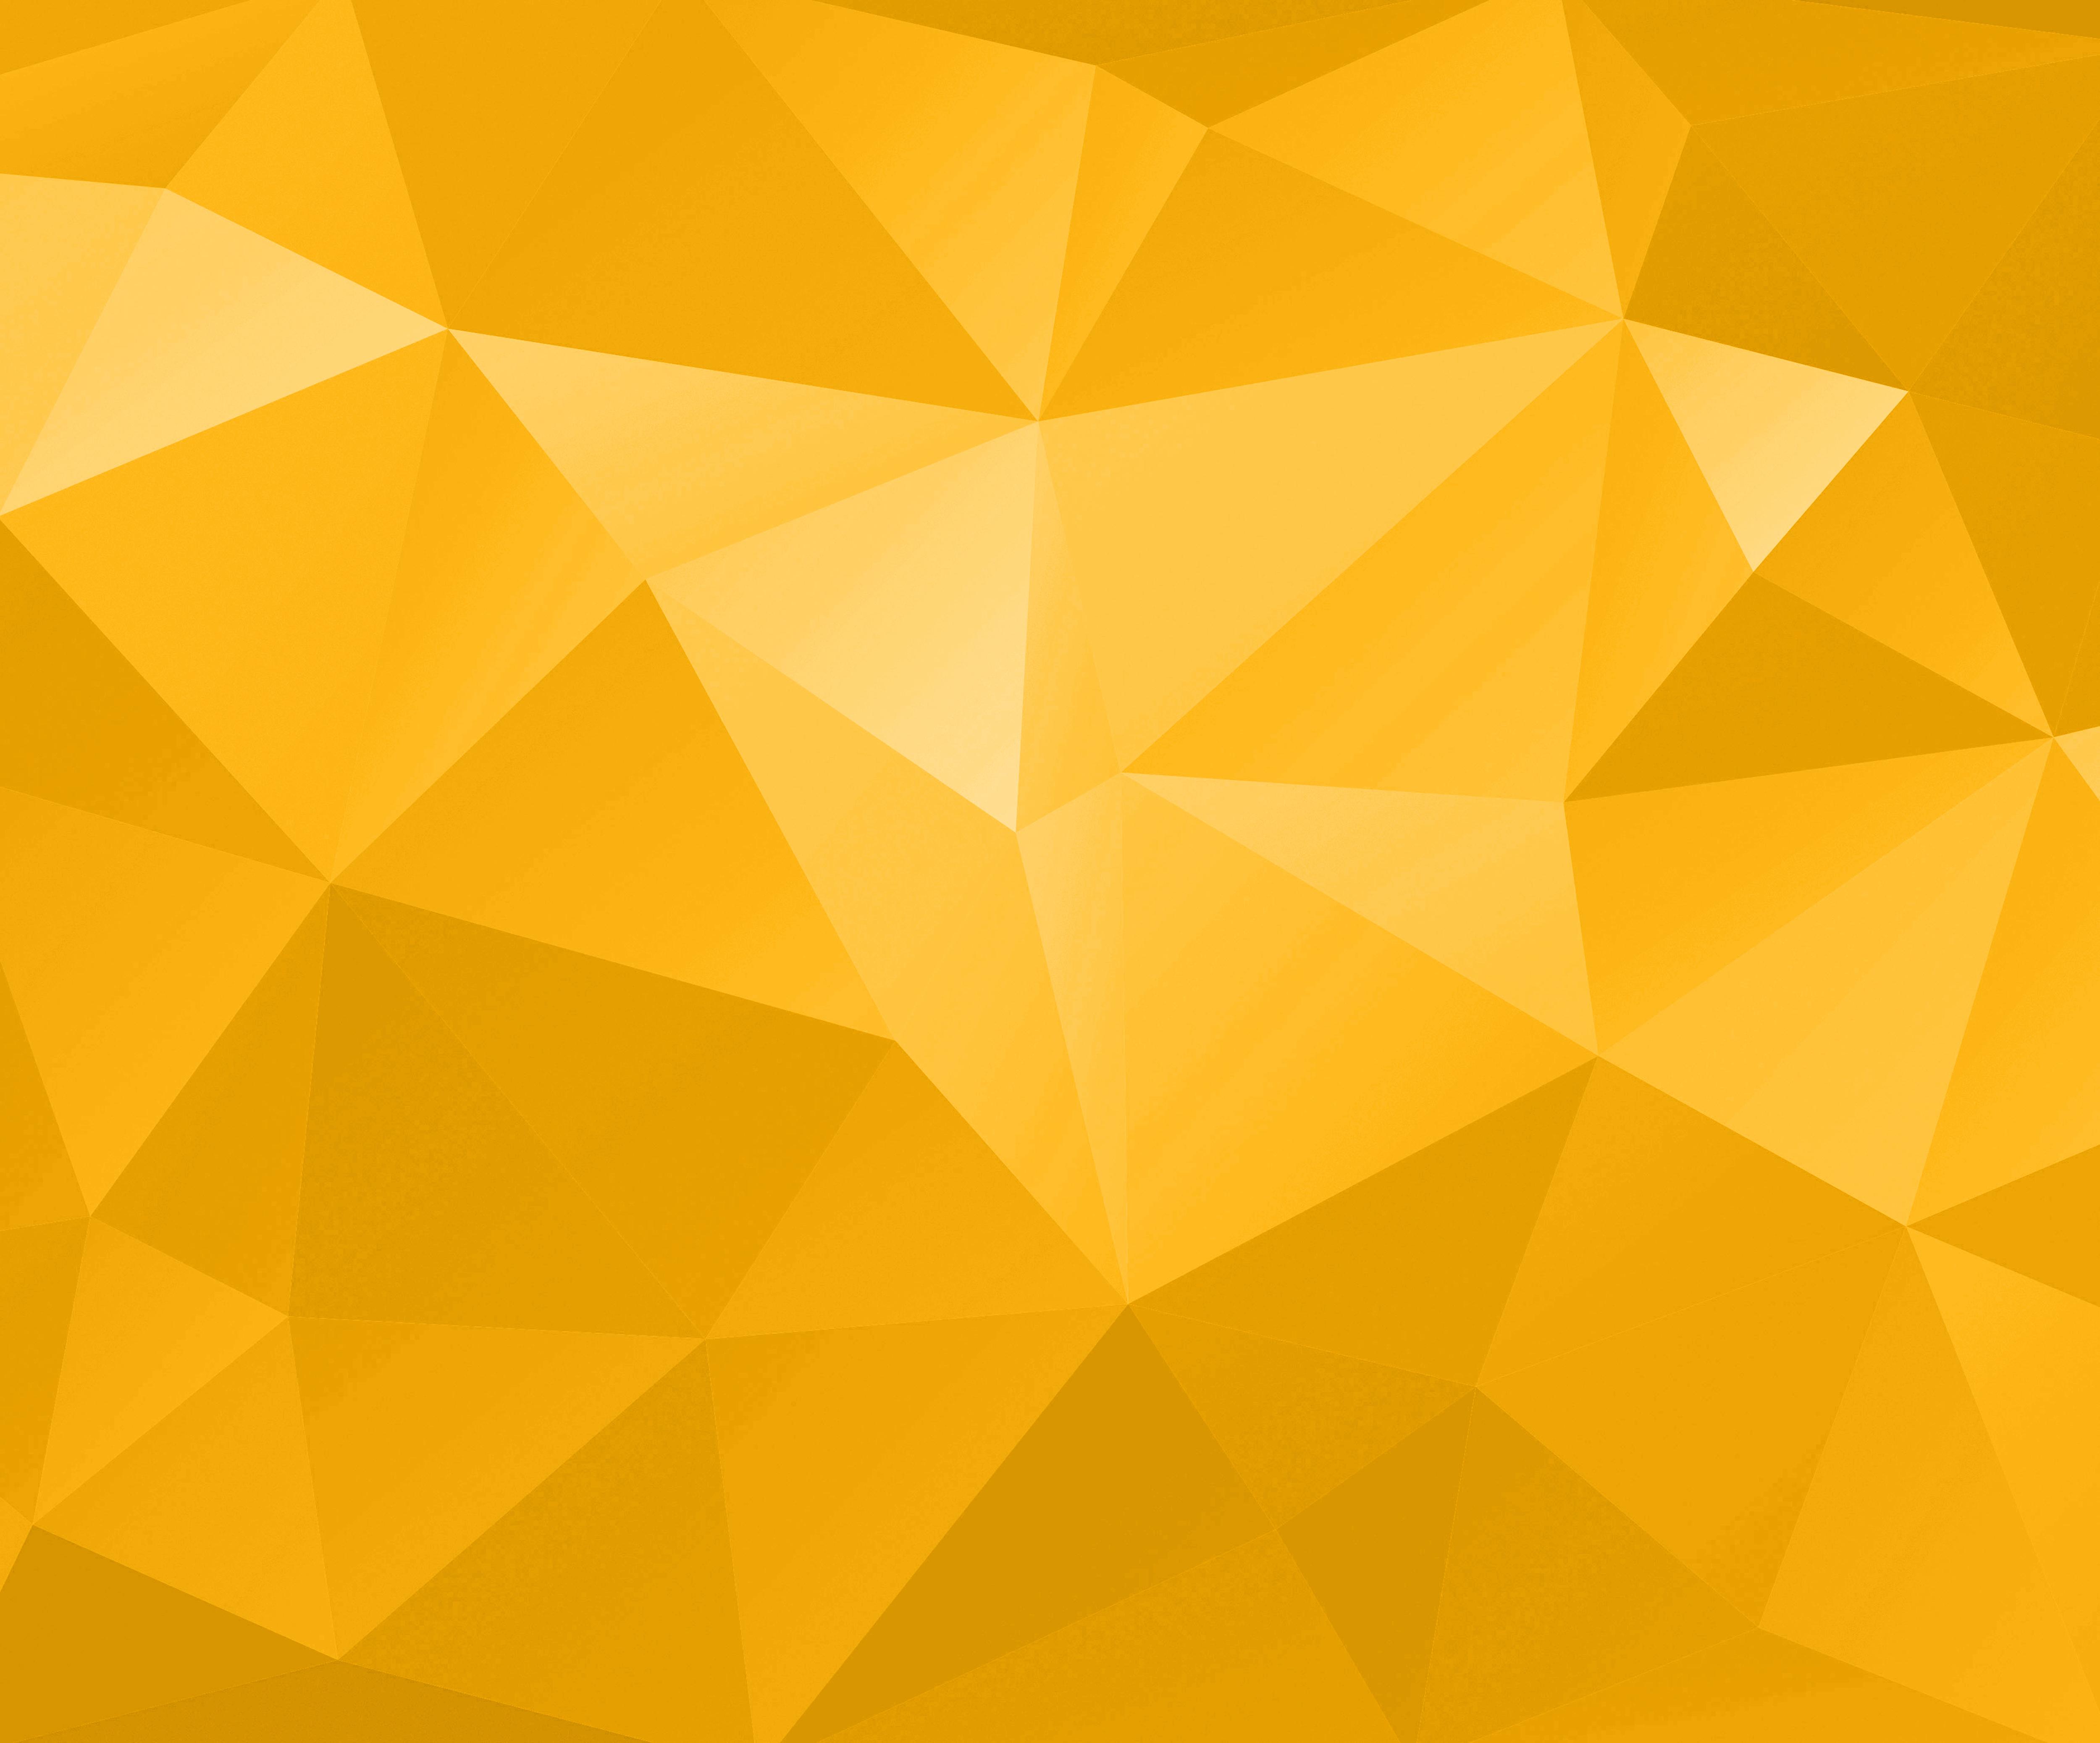 gold_prismtexture